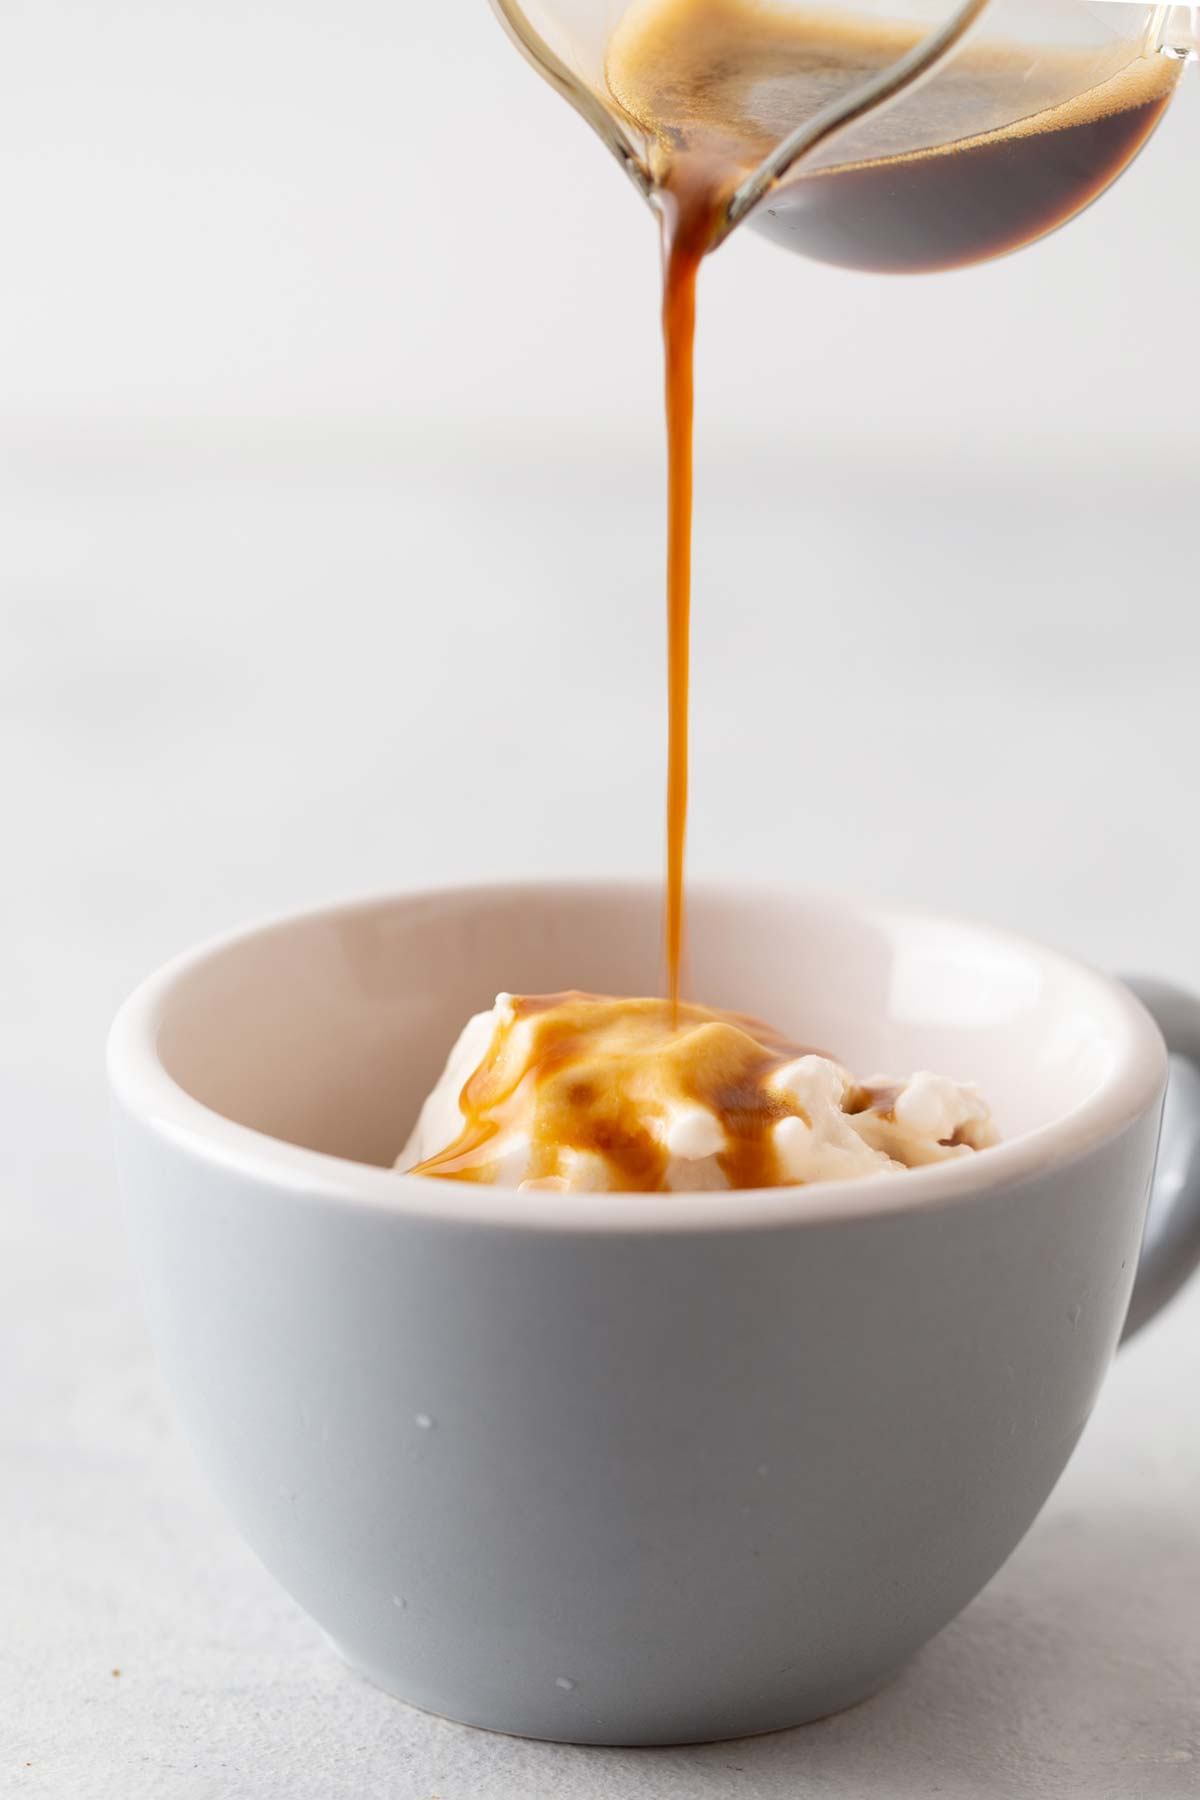 Pouring espresso into a small mug of ice cream to make an affogato.